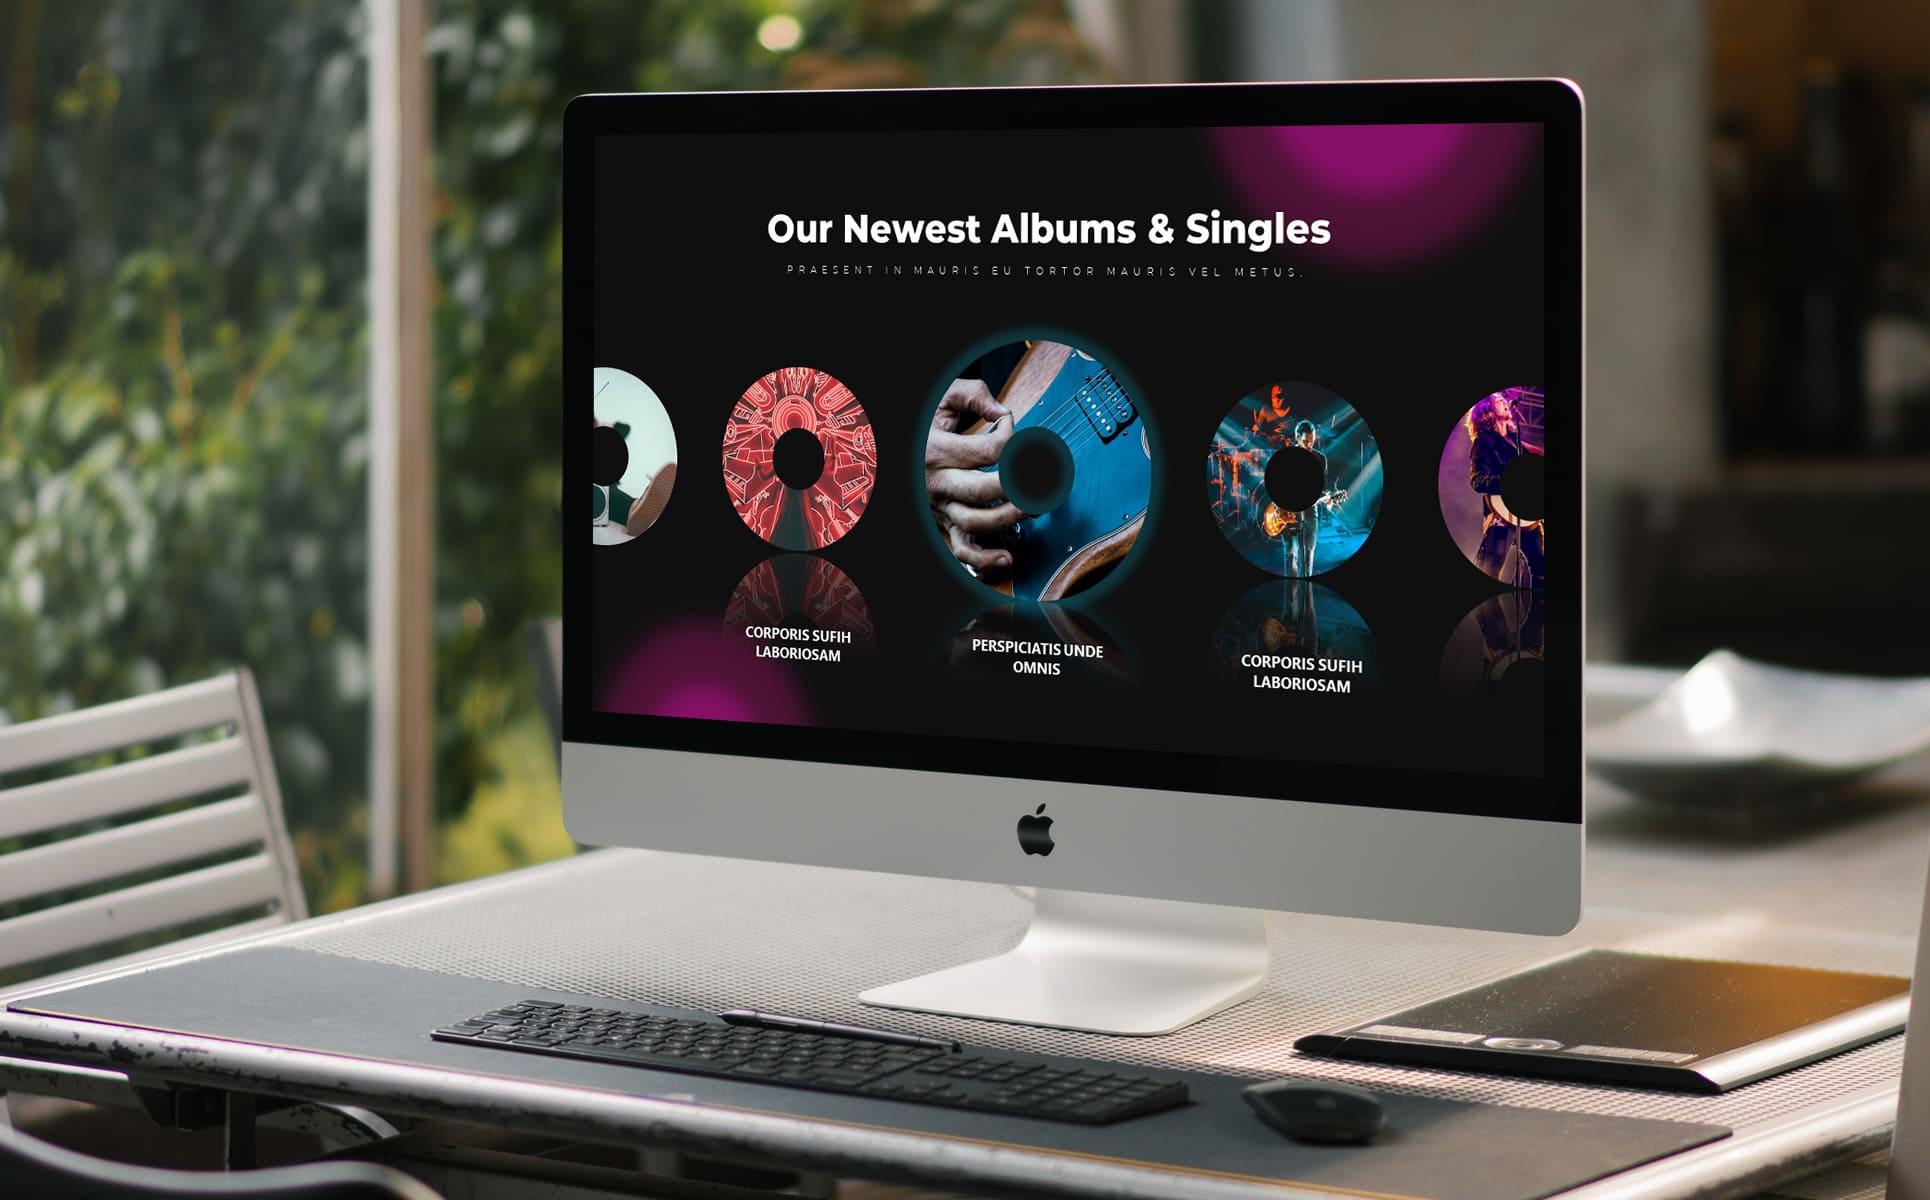 50 Slides Music Presentation Template 2021 by MasterBundles notebook preview mockup image.